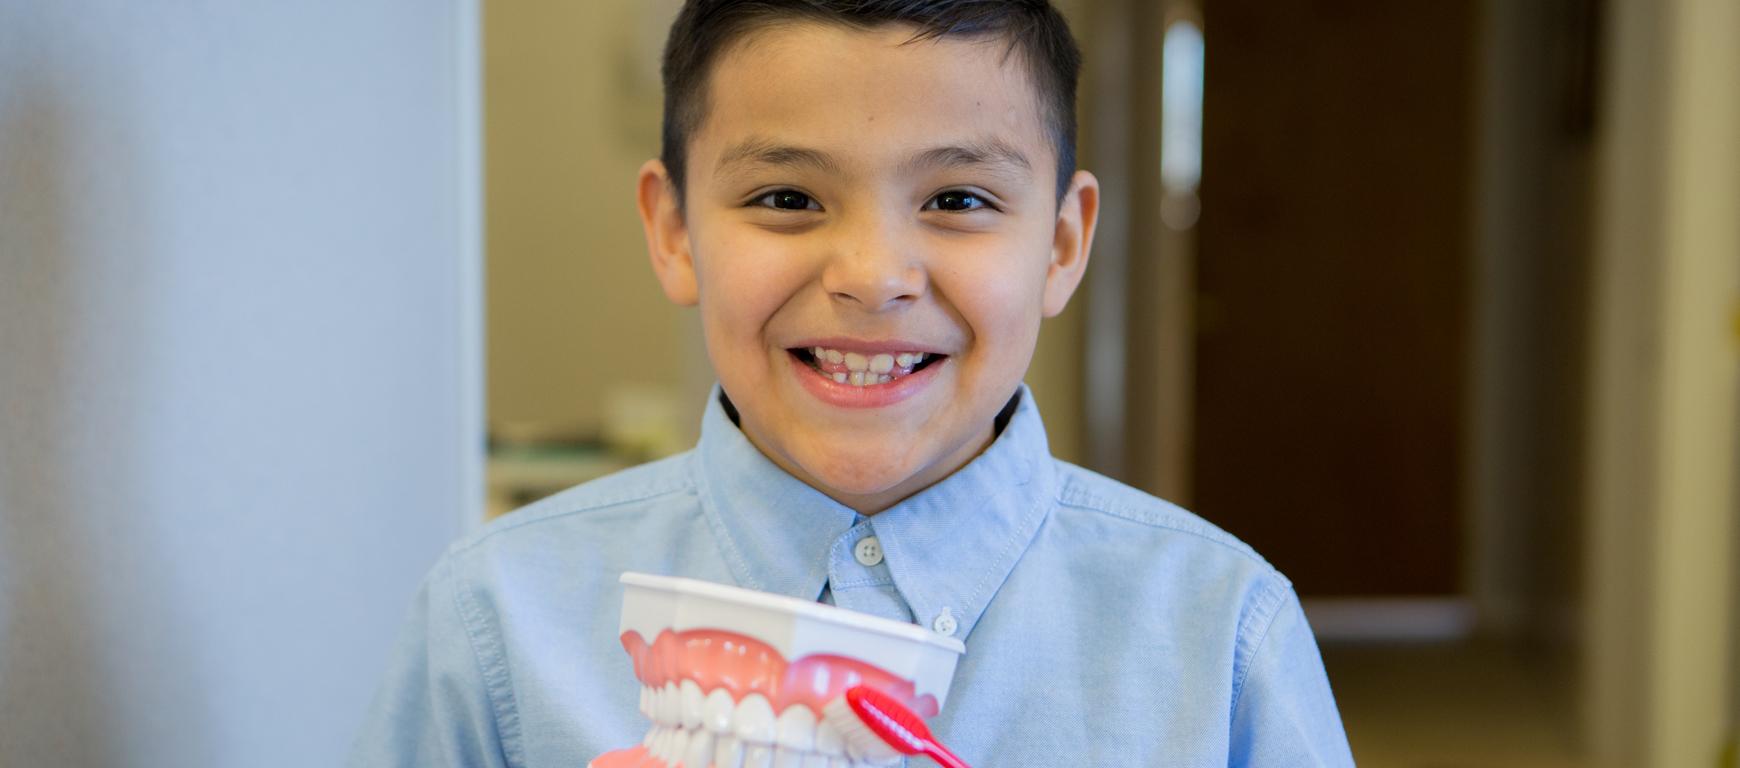 It's Dental Hygiene Month